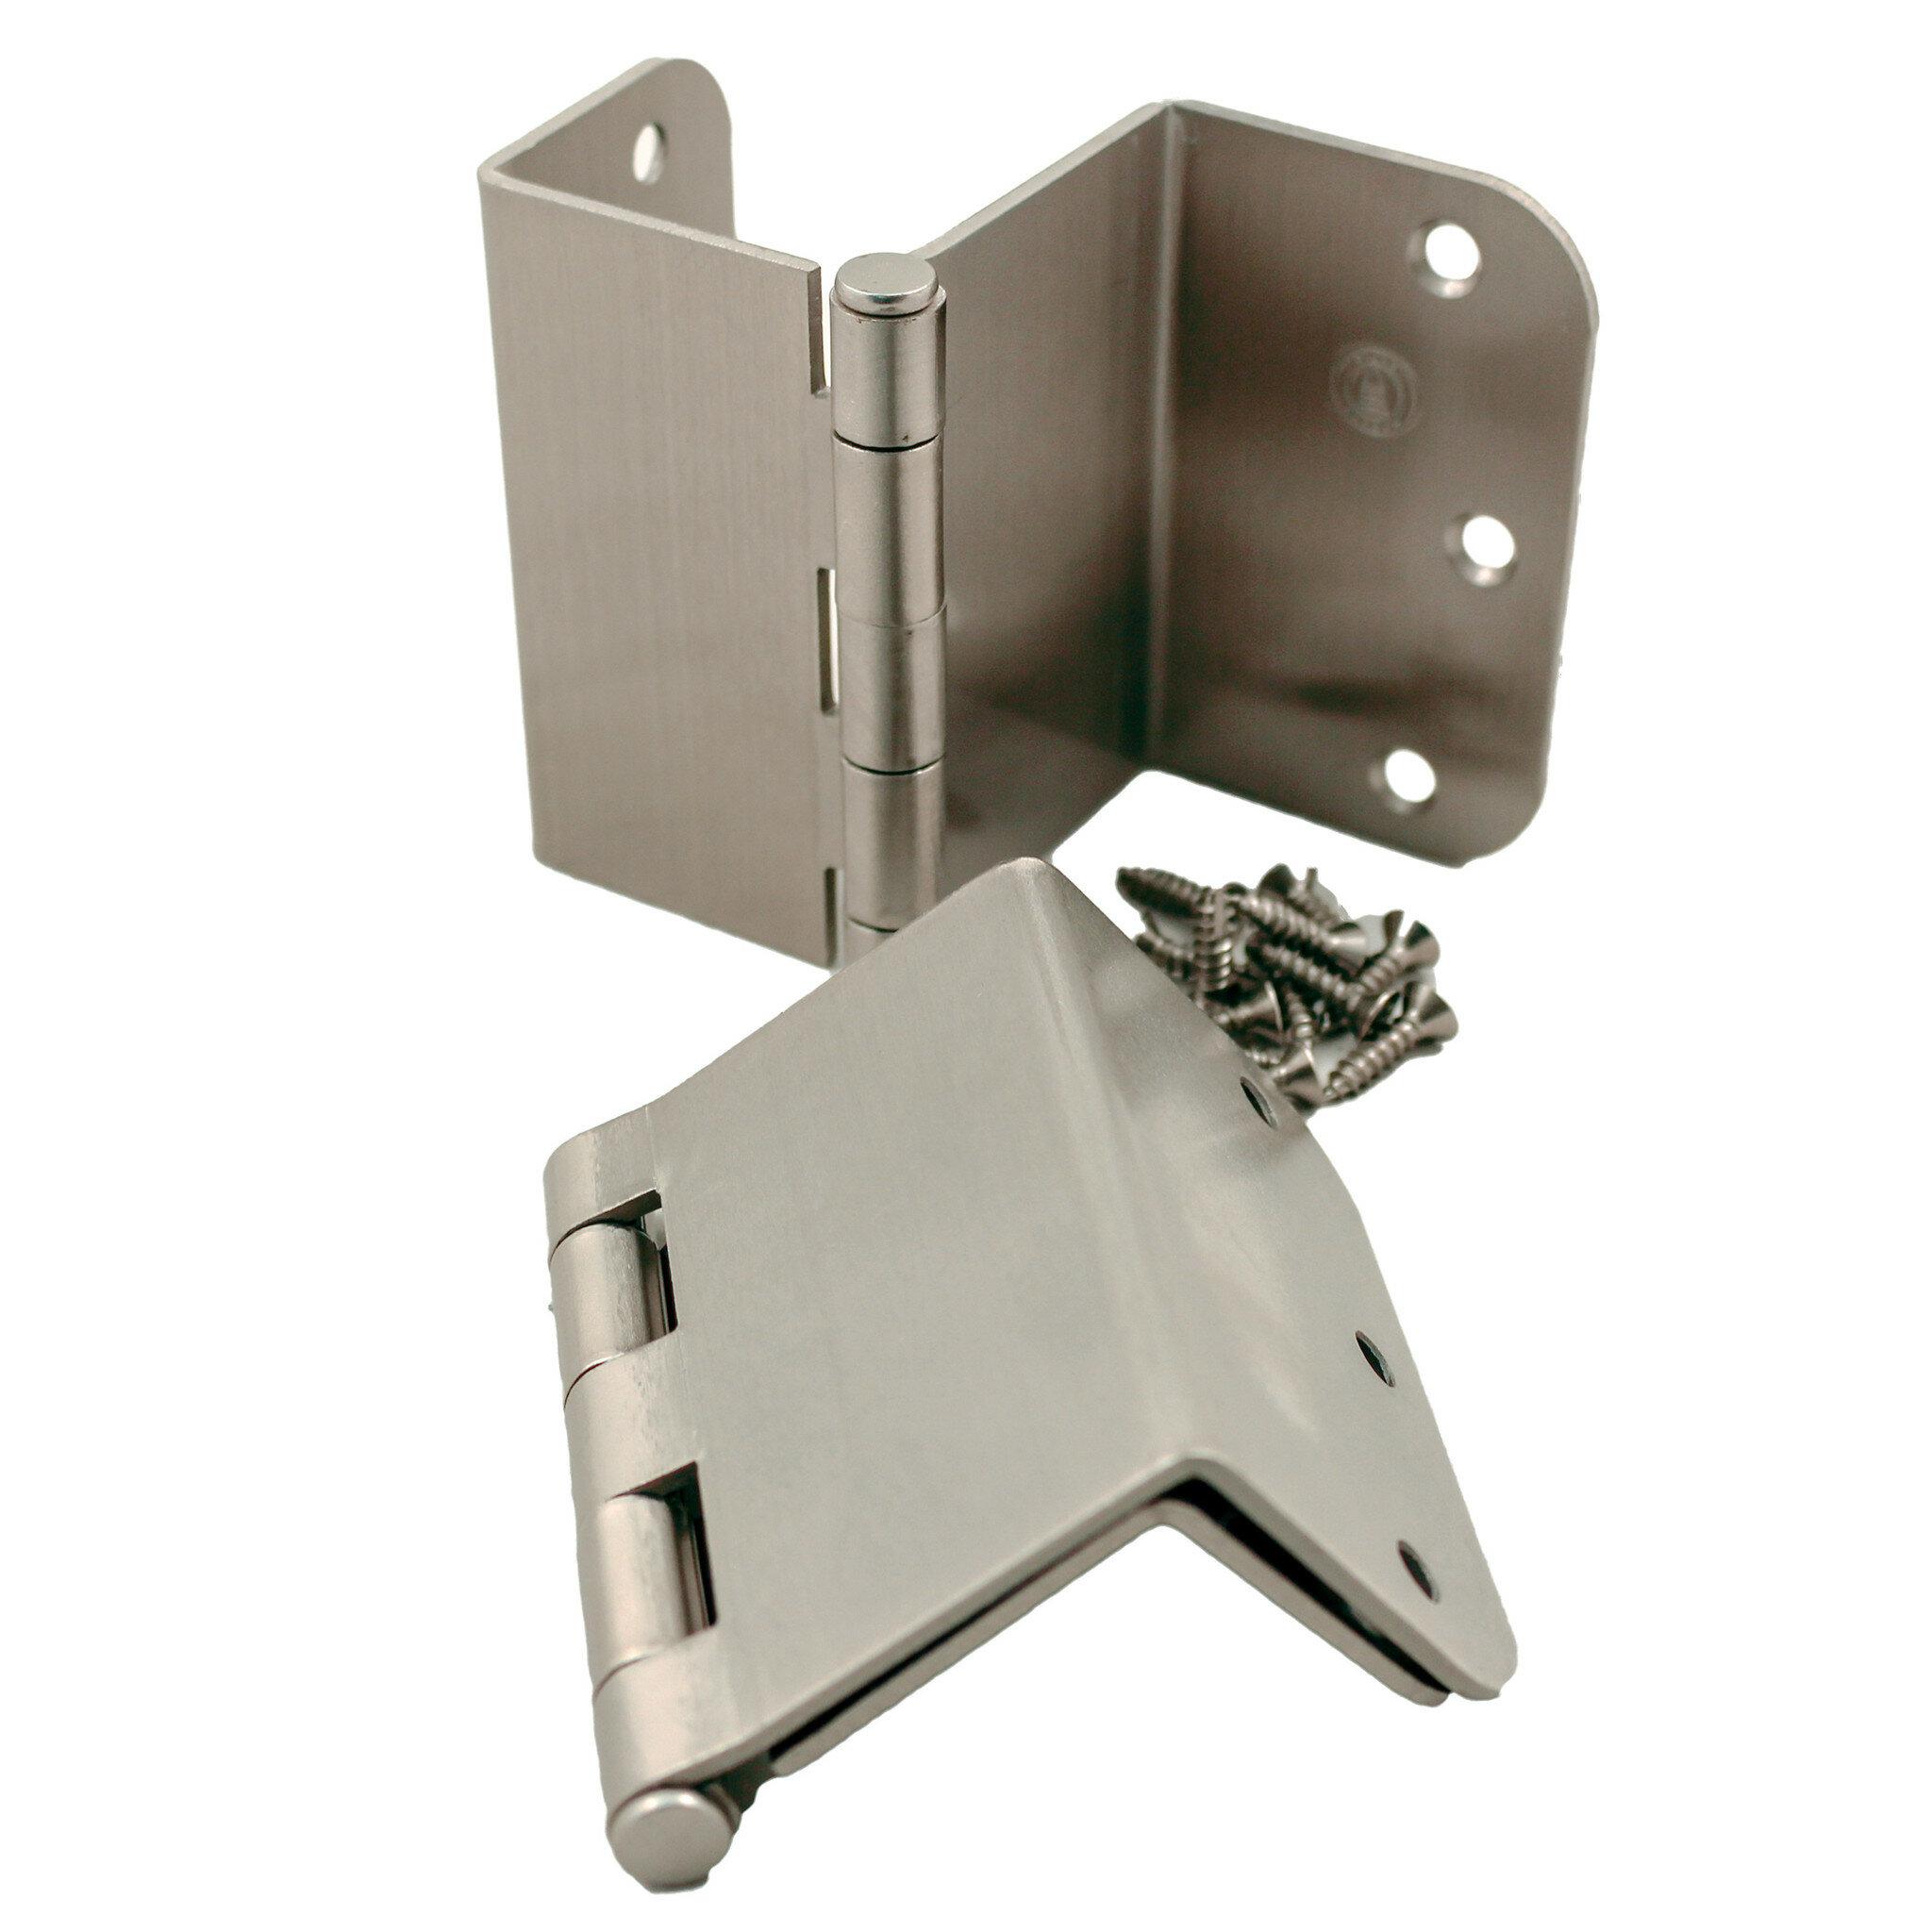 Stone Harbor Hardware 3.5\  H x 4.5\  W Offset Pair Door Hinges \u0026 Reviews | Wayfair  sc 1 st  Wayfair & Stone Harbor Hardware 3.5\